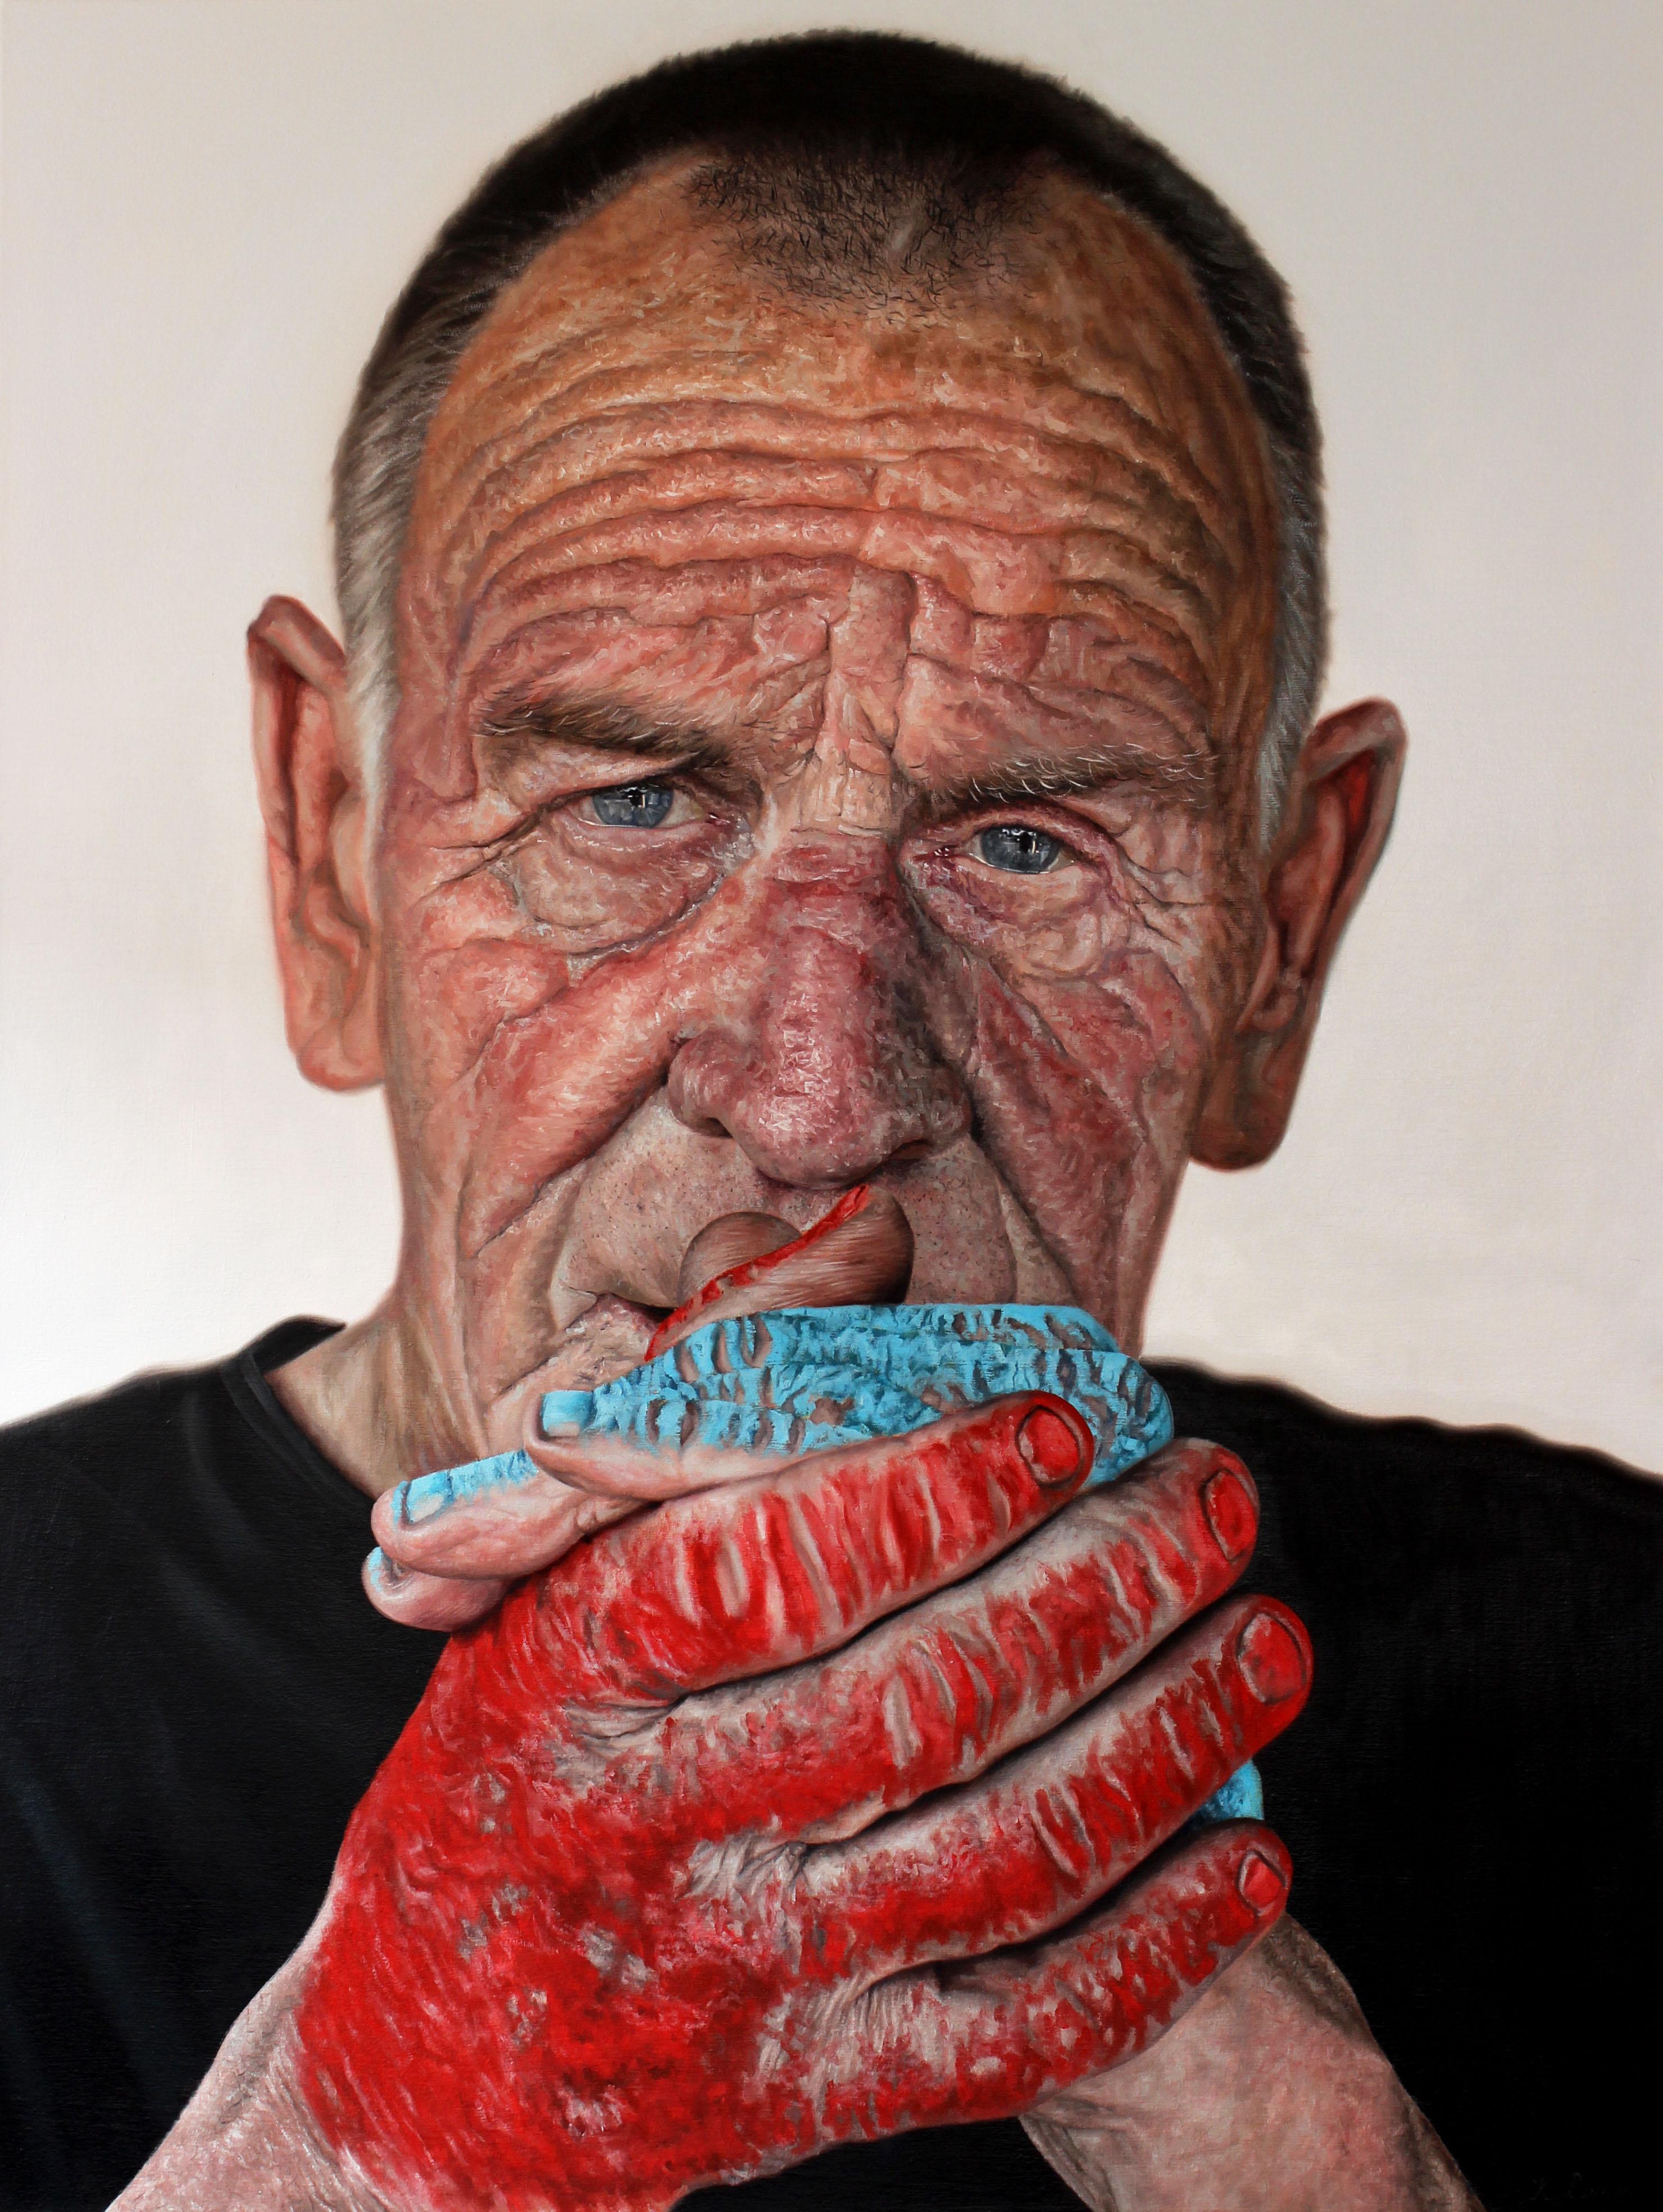 'Stephen' Oil on canvas, 97cm x 127cm, Kyle Barnes